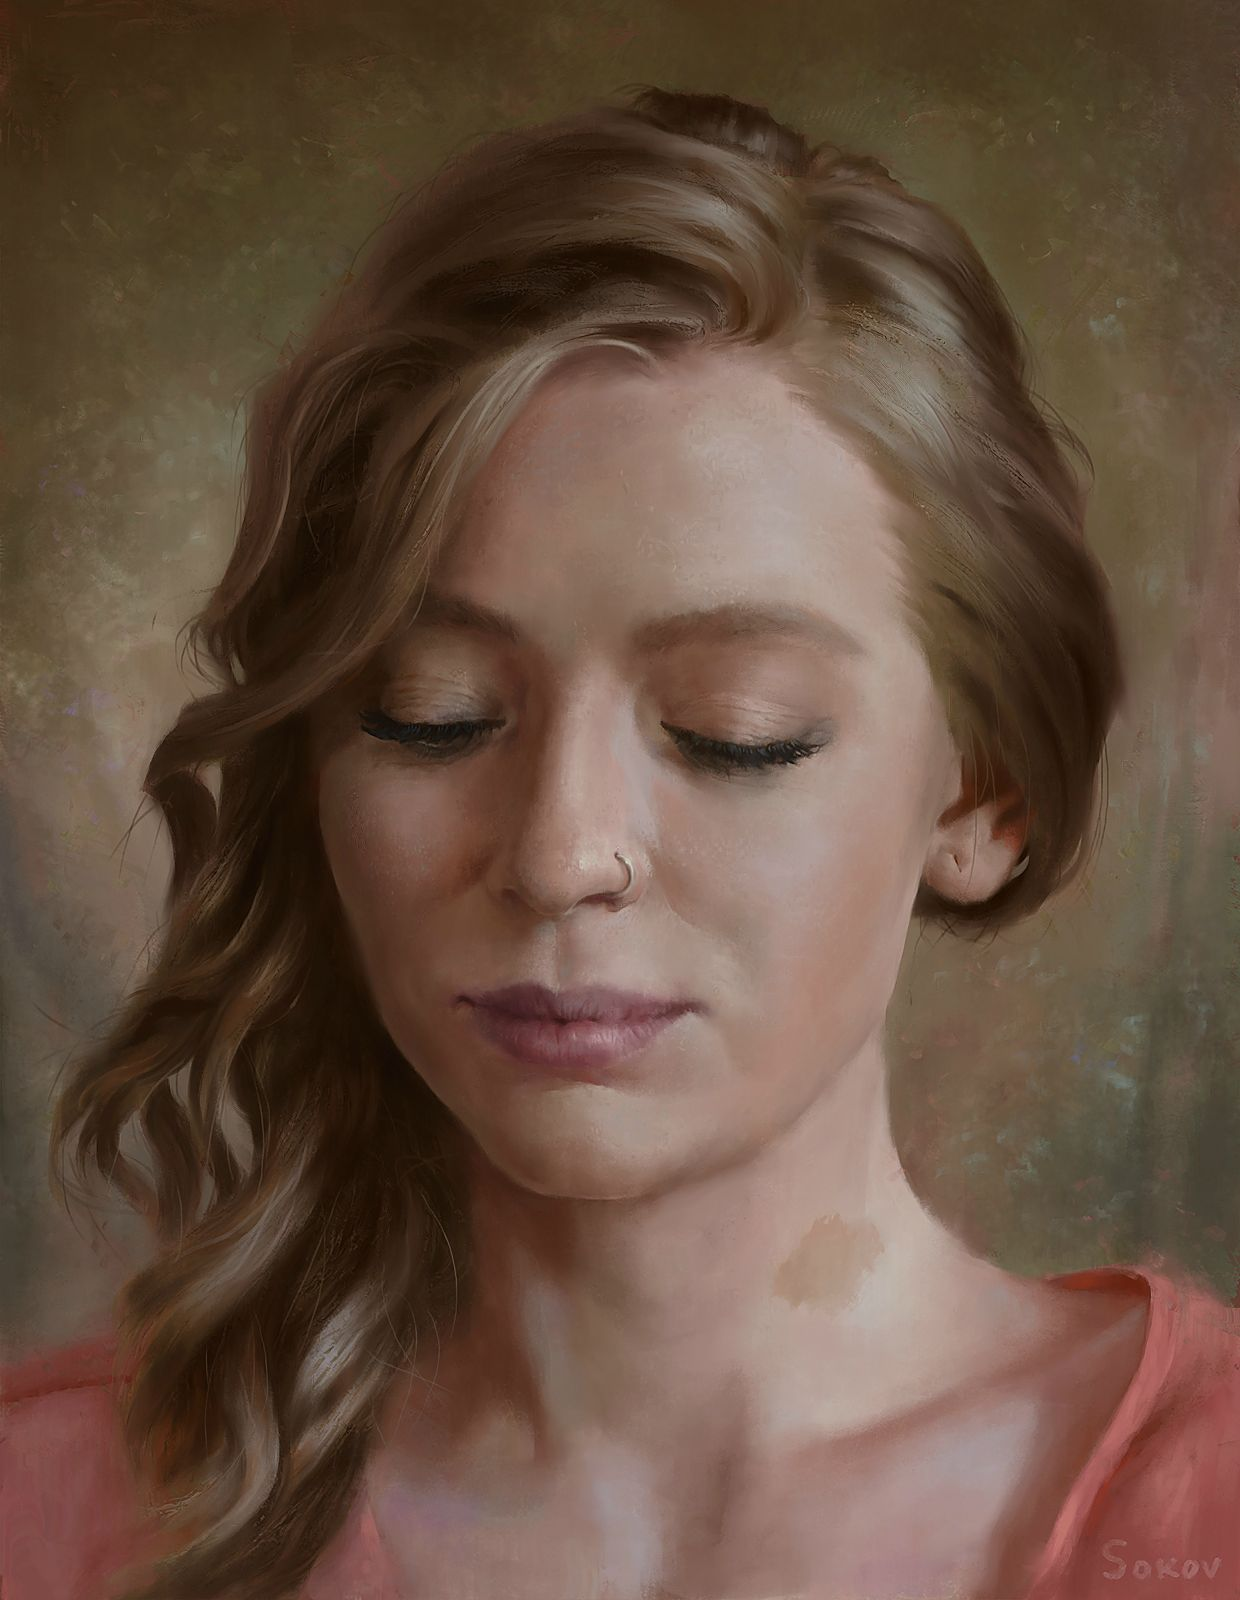 pintor_pavelsokov_1